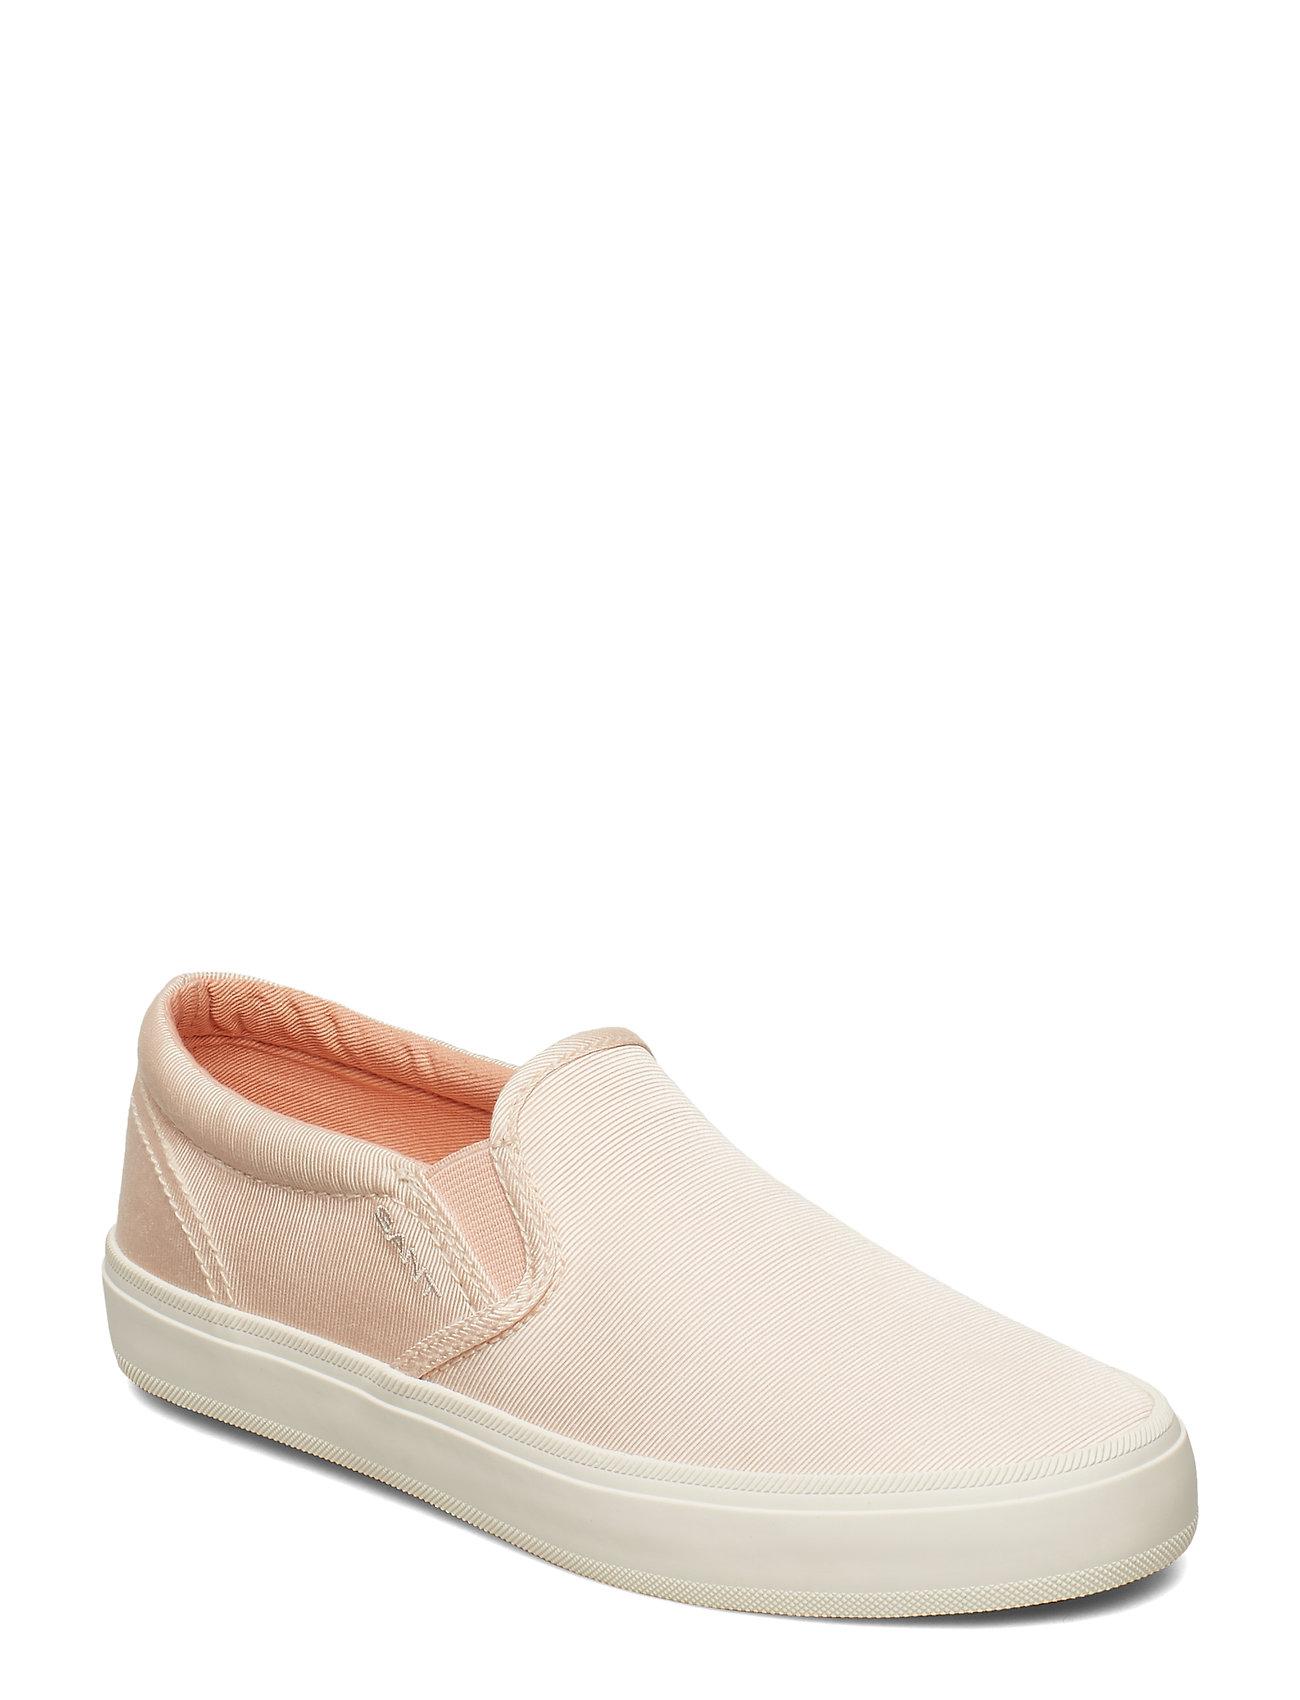 GANT Zoee Slip-on shoes - SILVERPINK